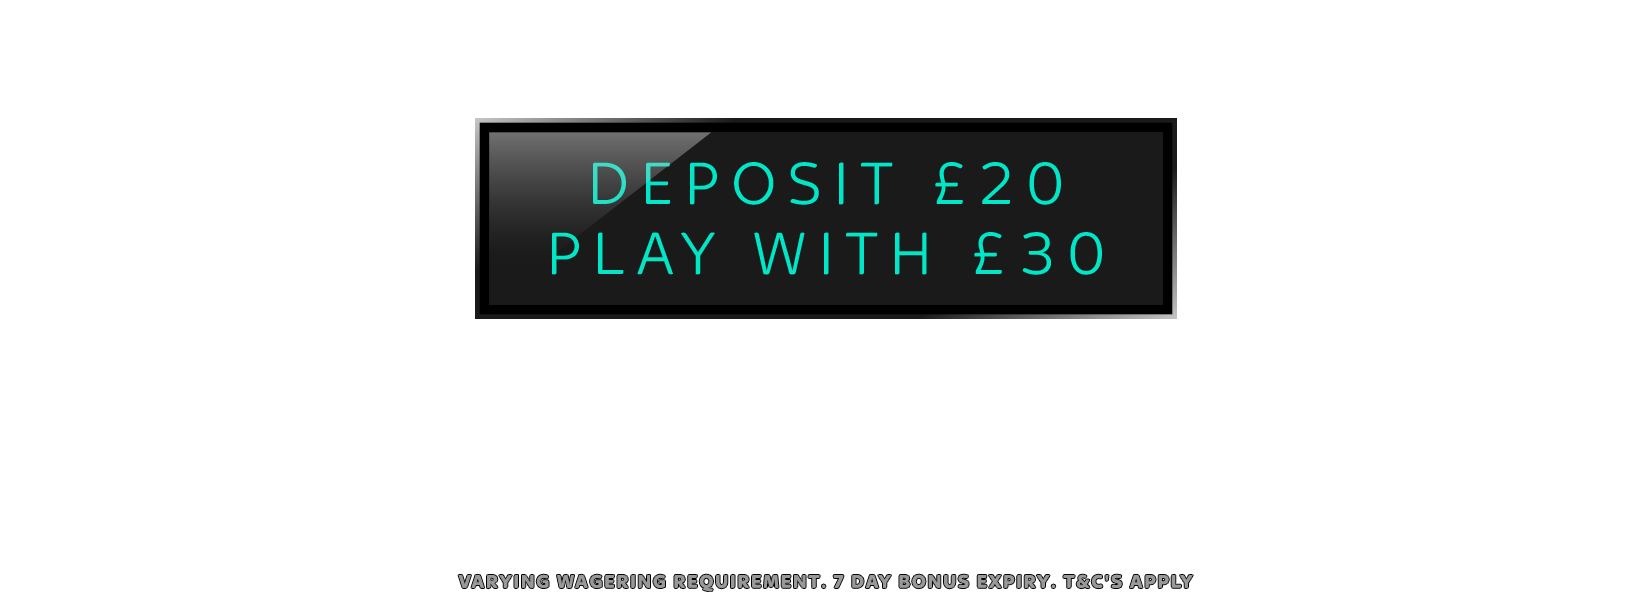 C.O.Deposit20PlayWith30